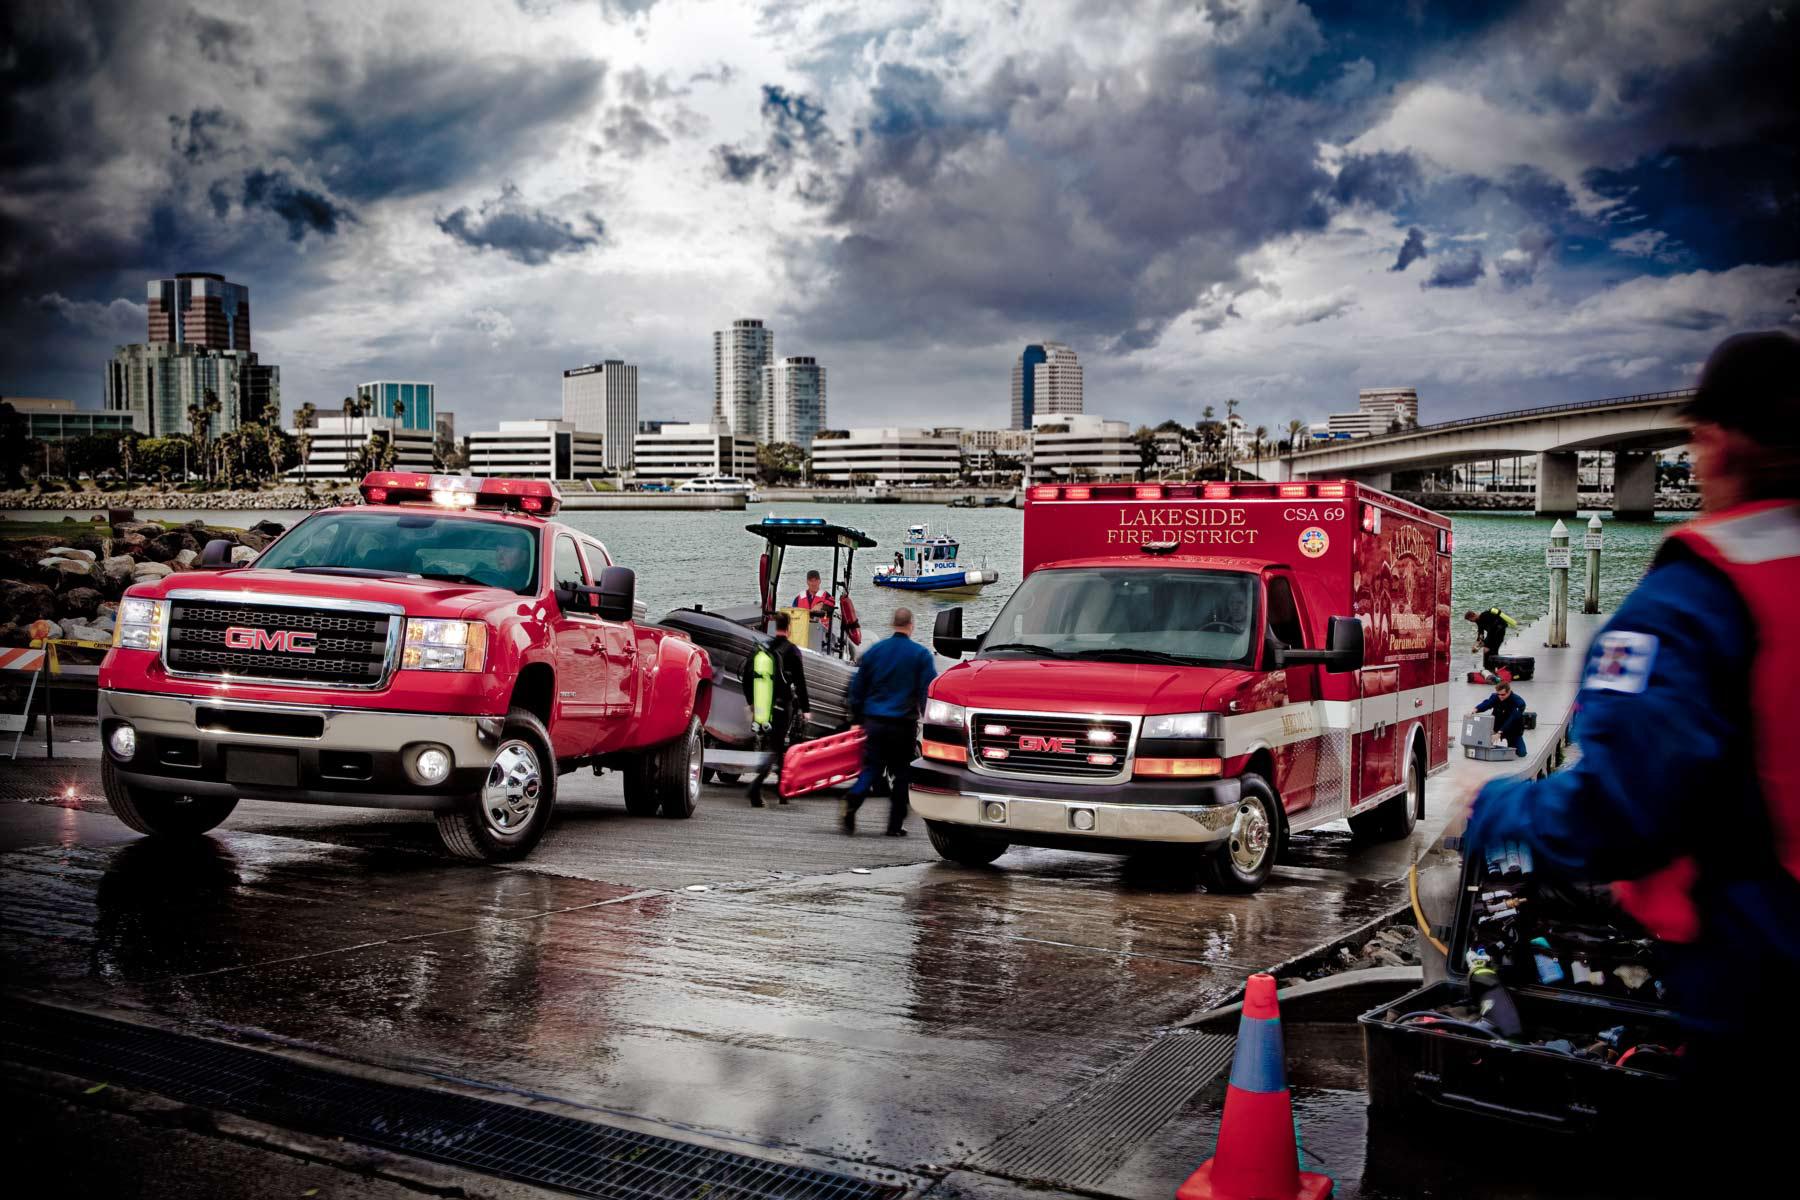 Gmc_trucksw.jpg